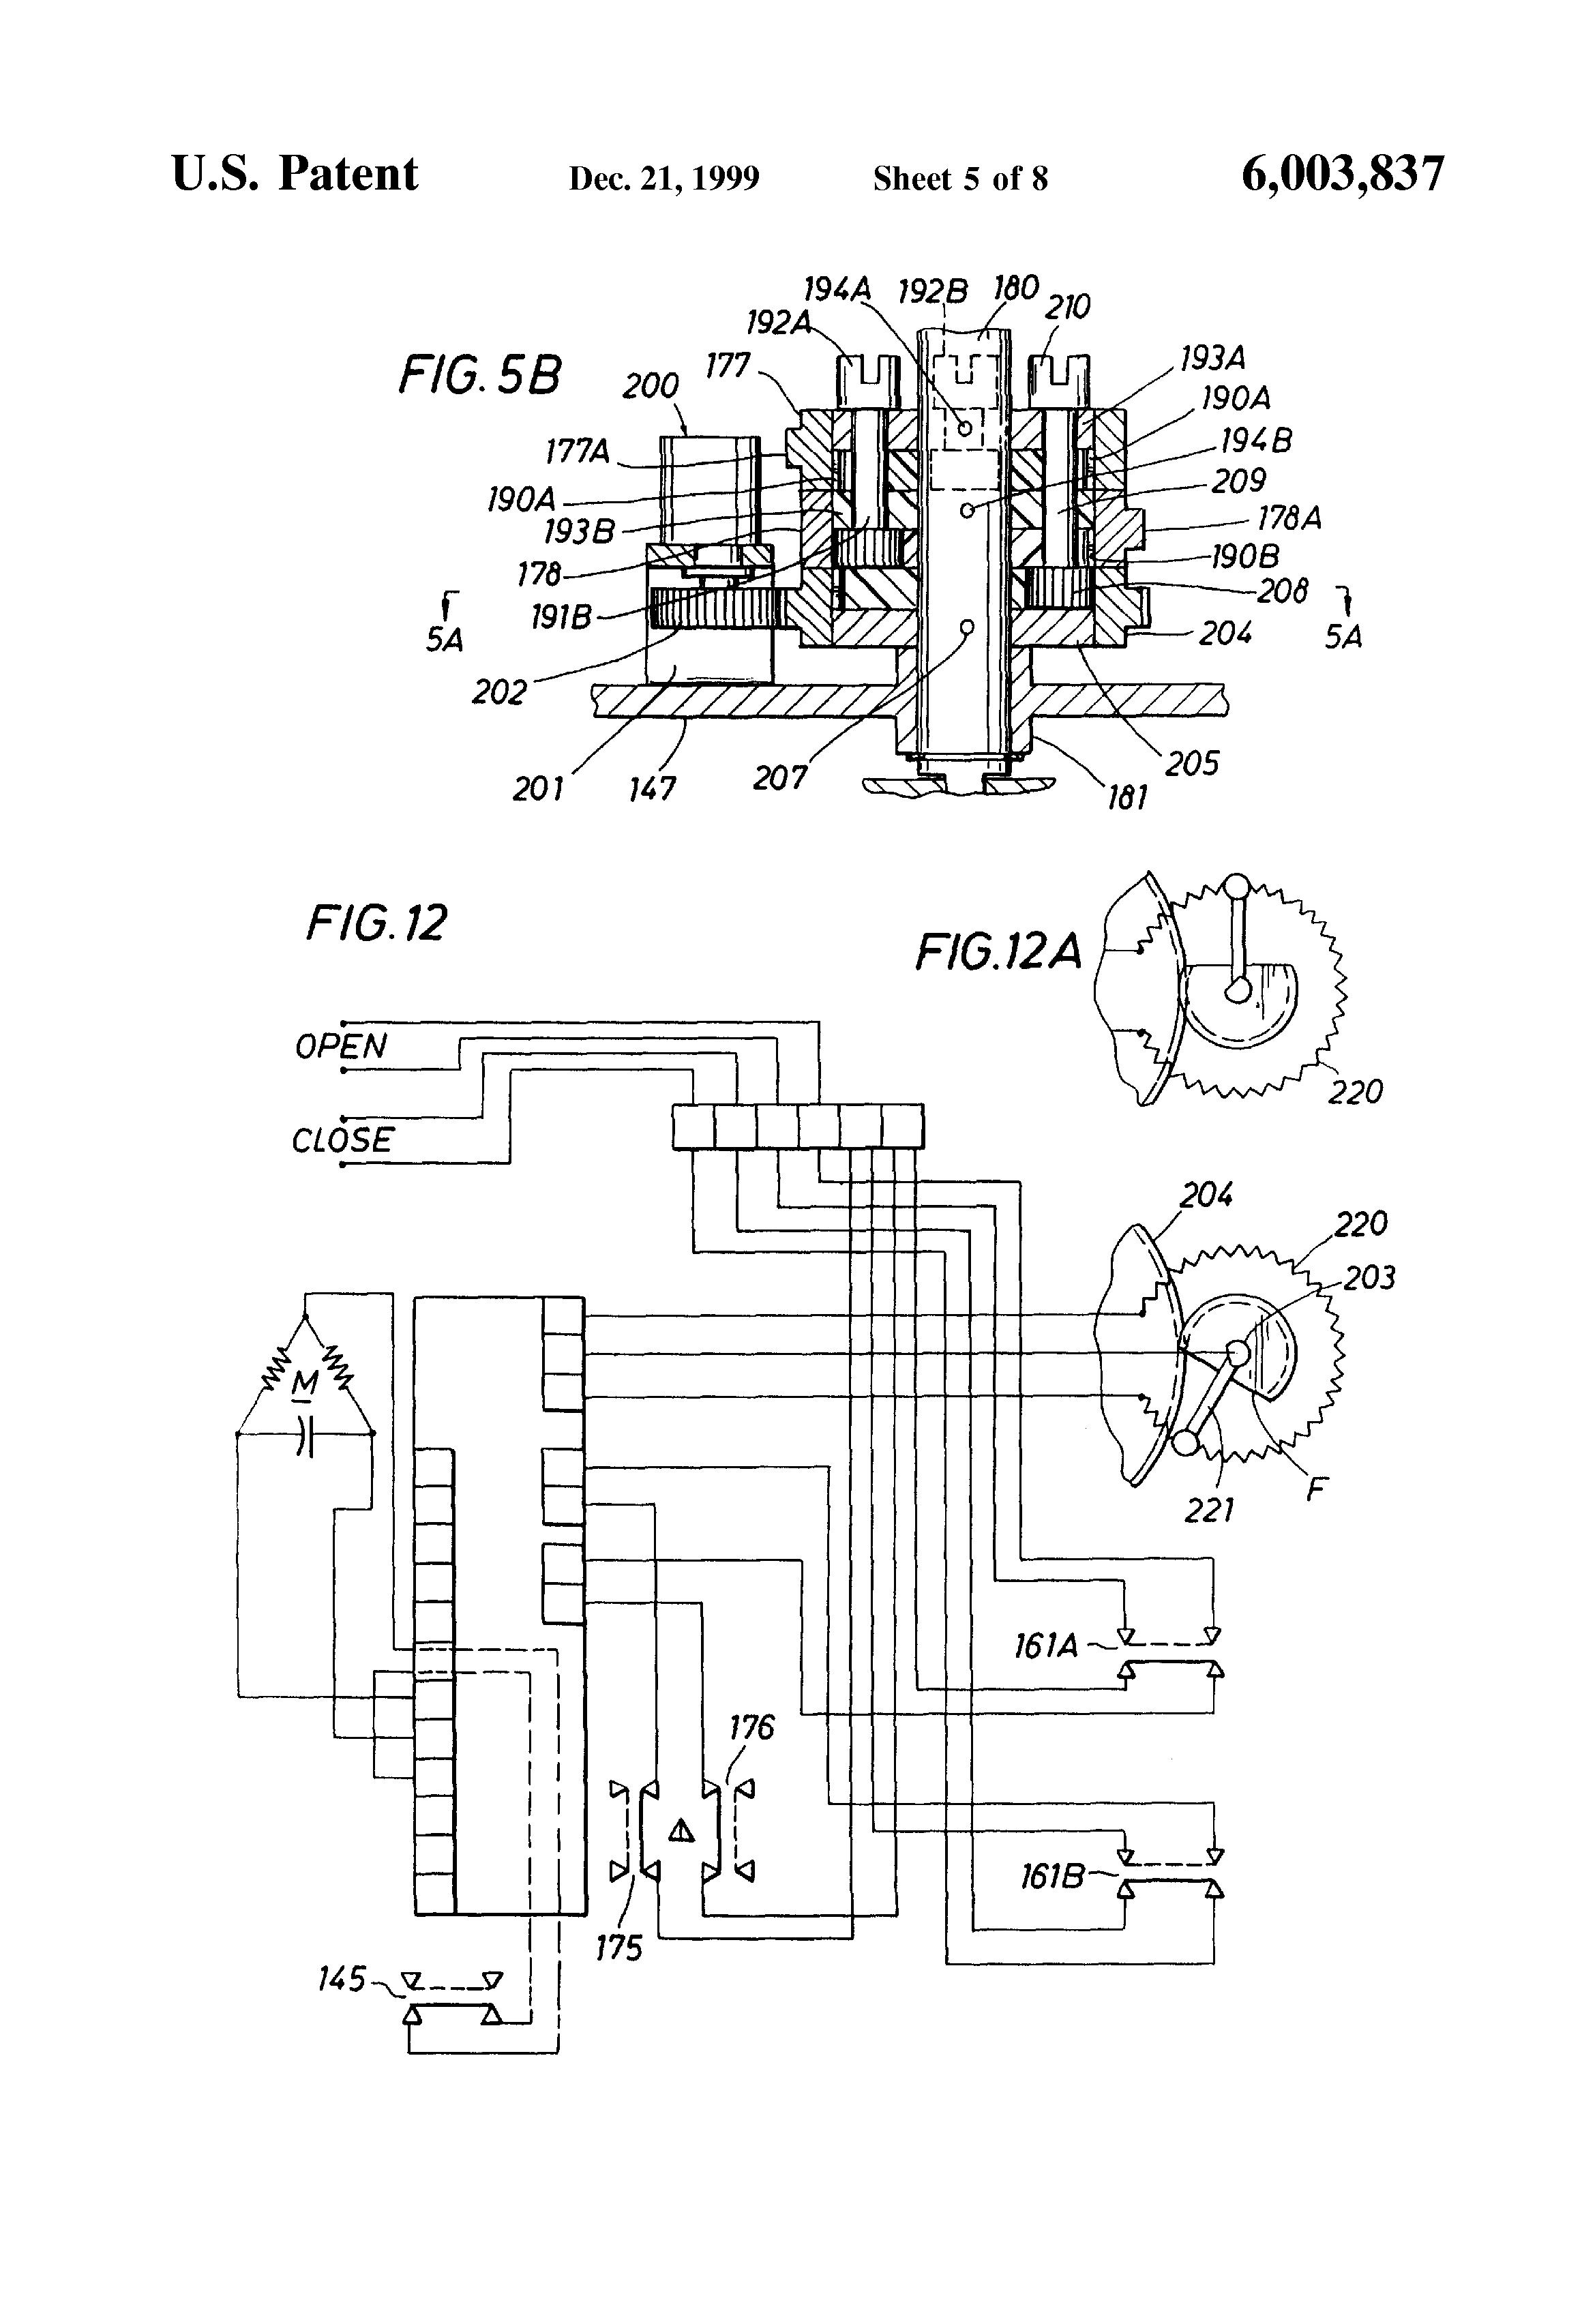 limitorque dc wiring diagrams best wiring library limitorque l120 20 wiring diagram 33 wiring diagram limitorque l120 pdf limitorque l120 40 1ph